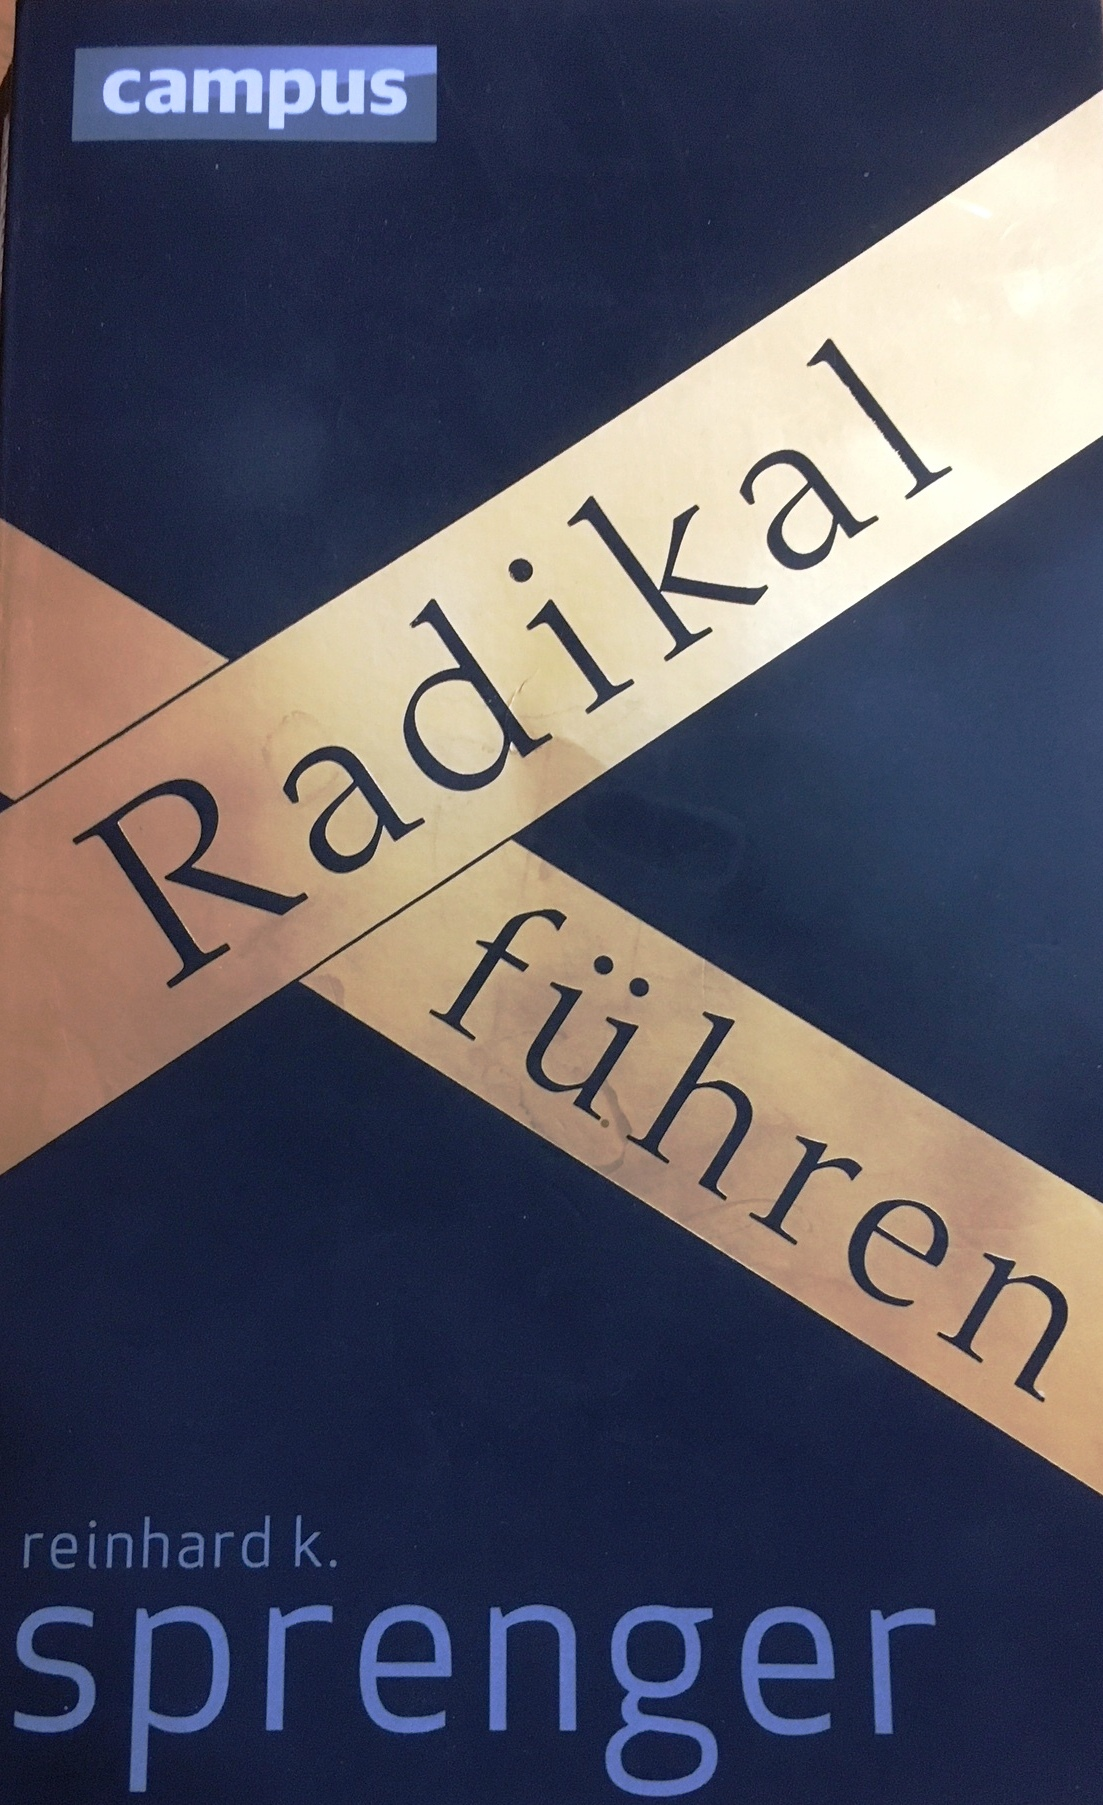 Sprenger radikal fuehren